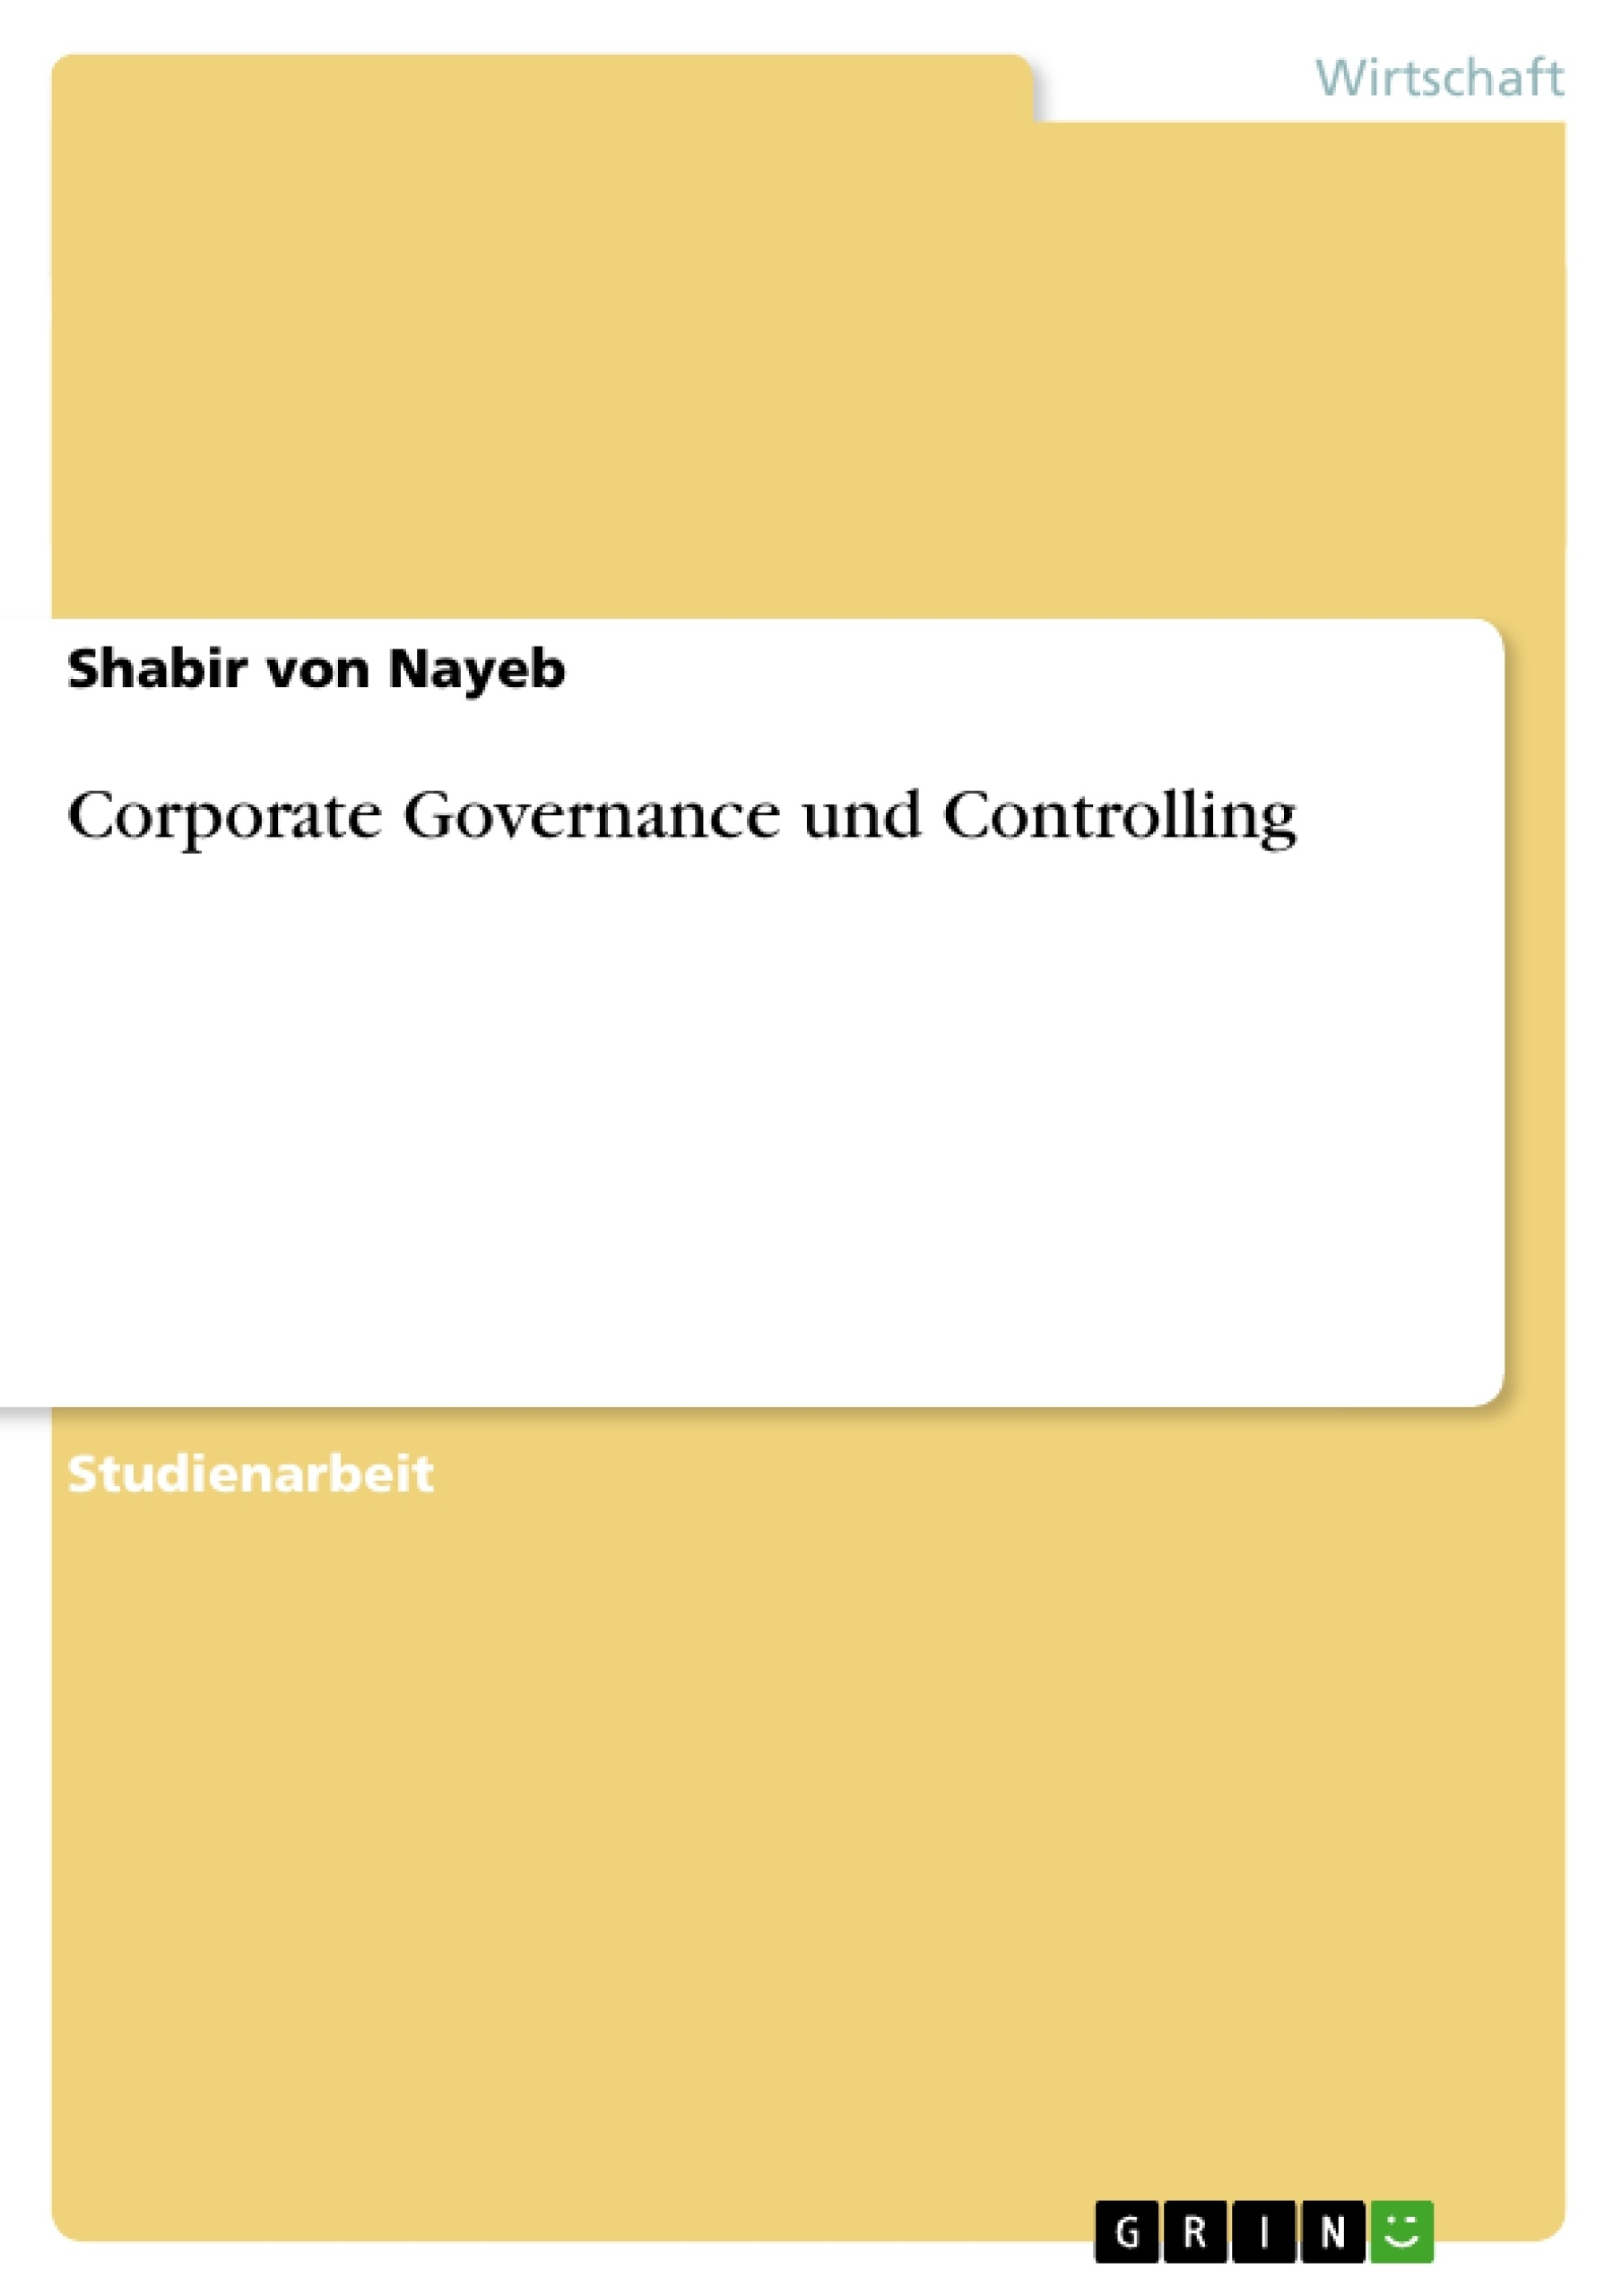 Titel: Corporate Governance und Controlling